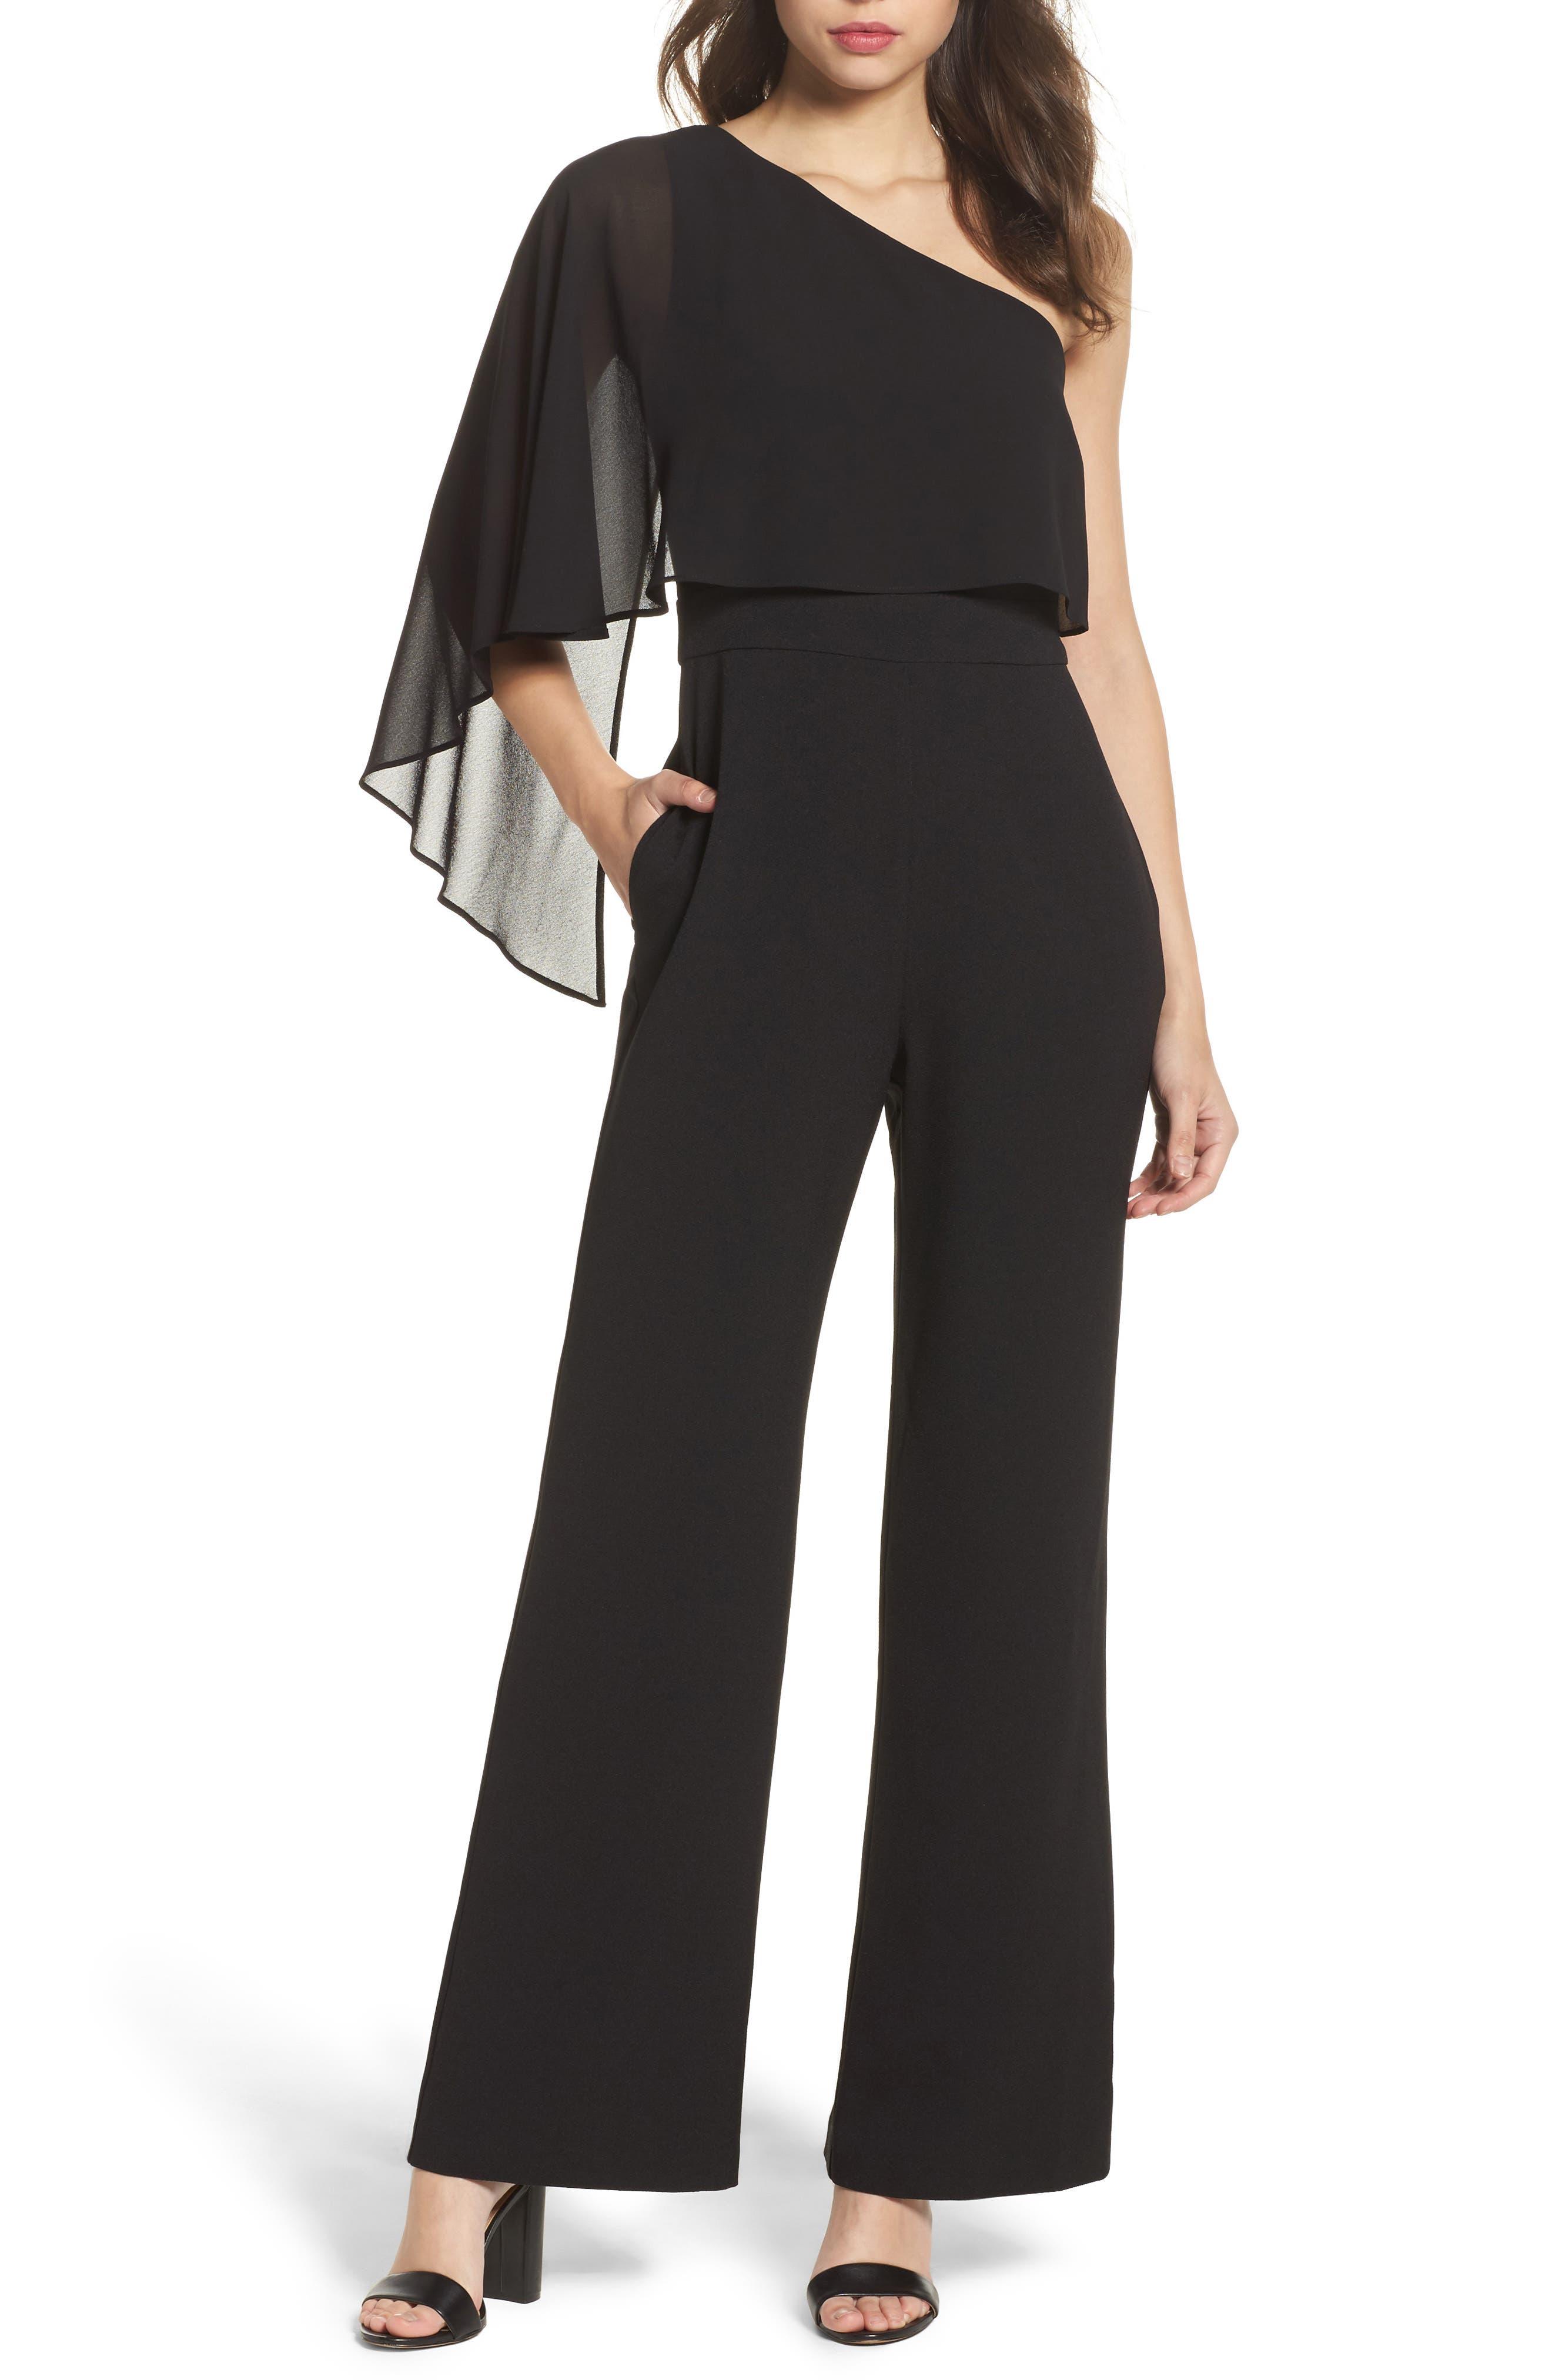 Cape Overlay One-Shoulder Jumpsuit,                         Main,                         color, Black